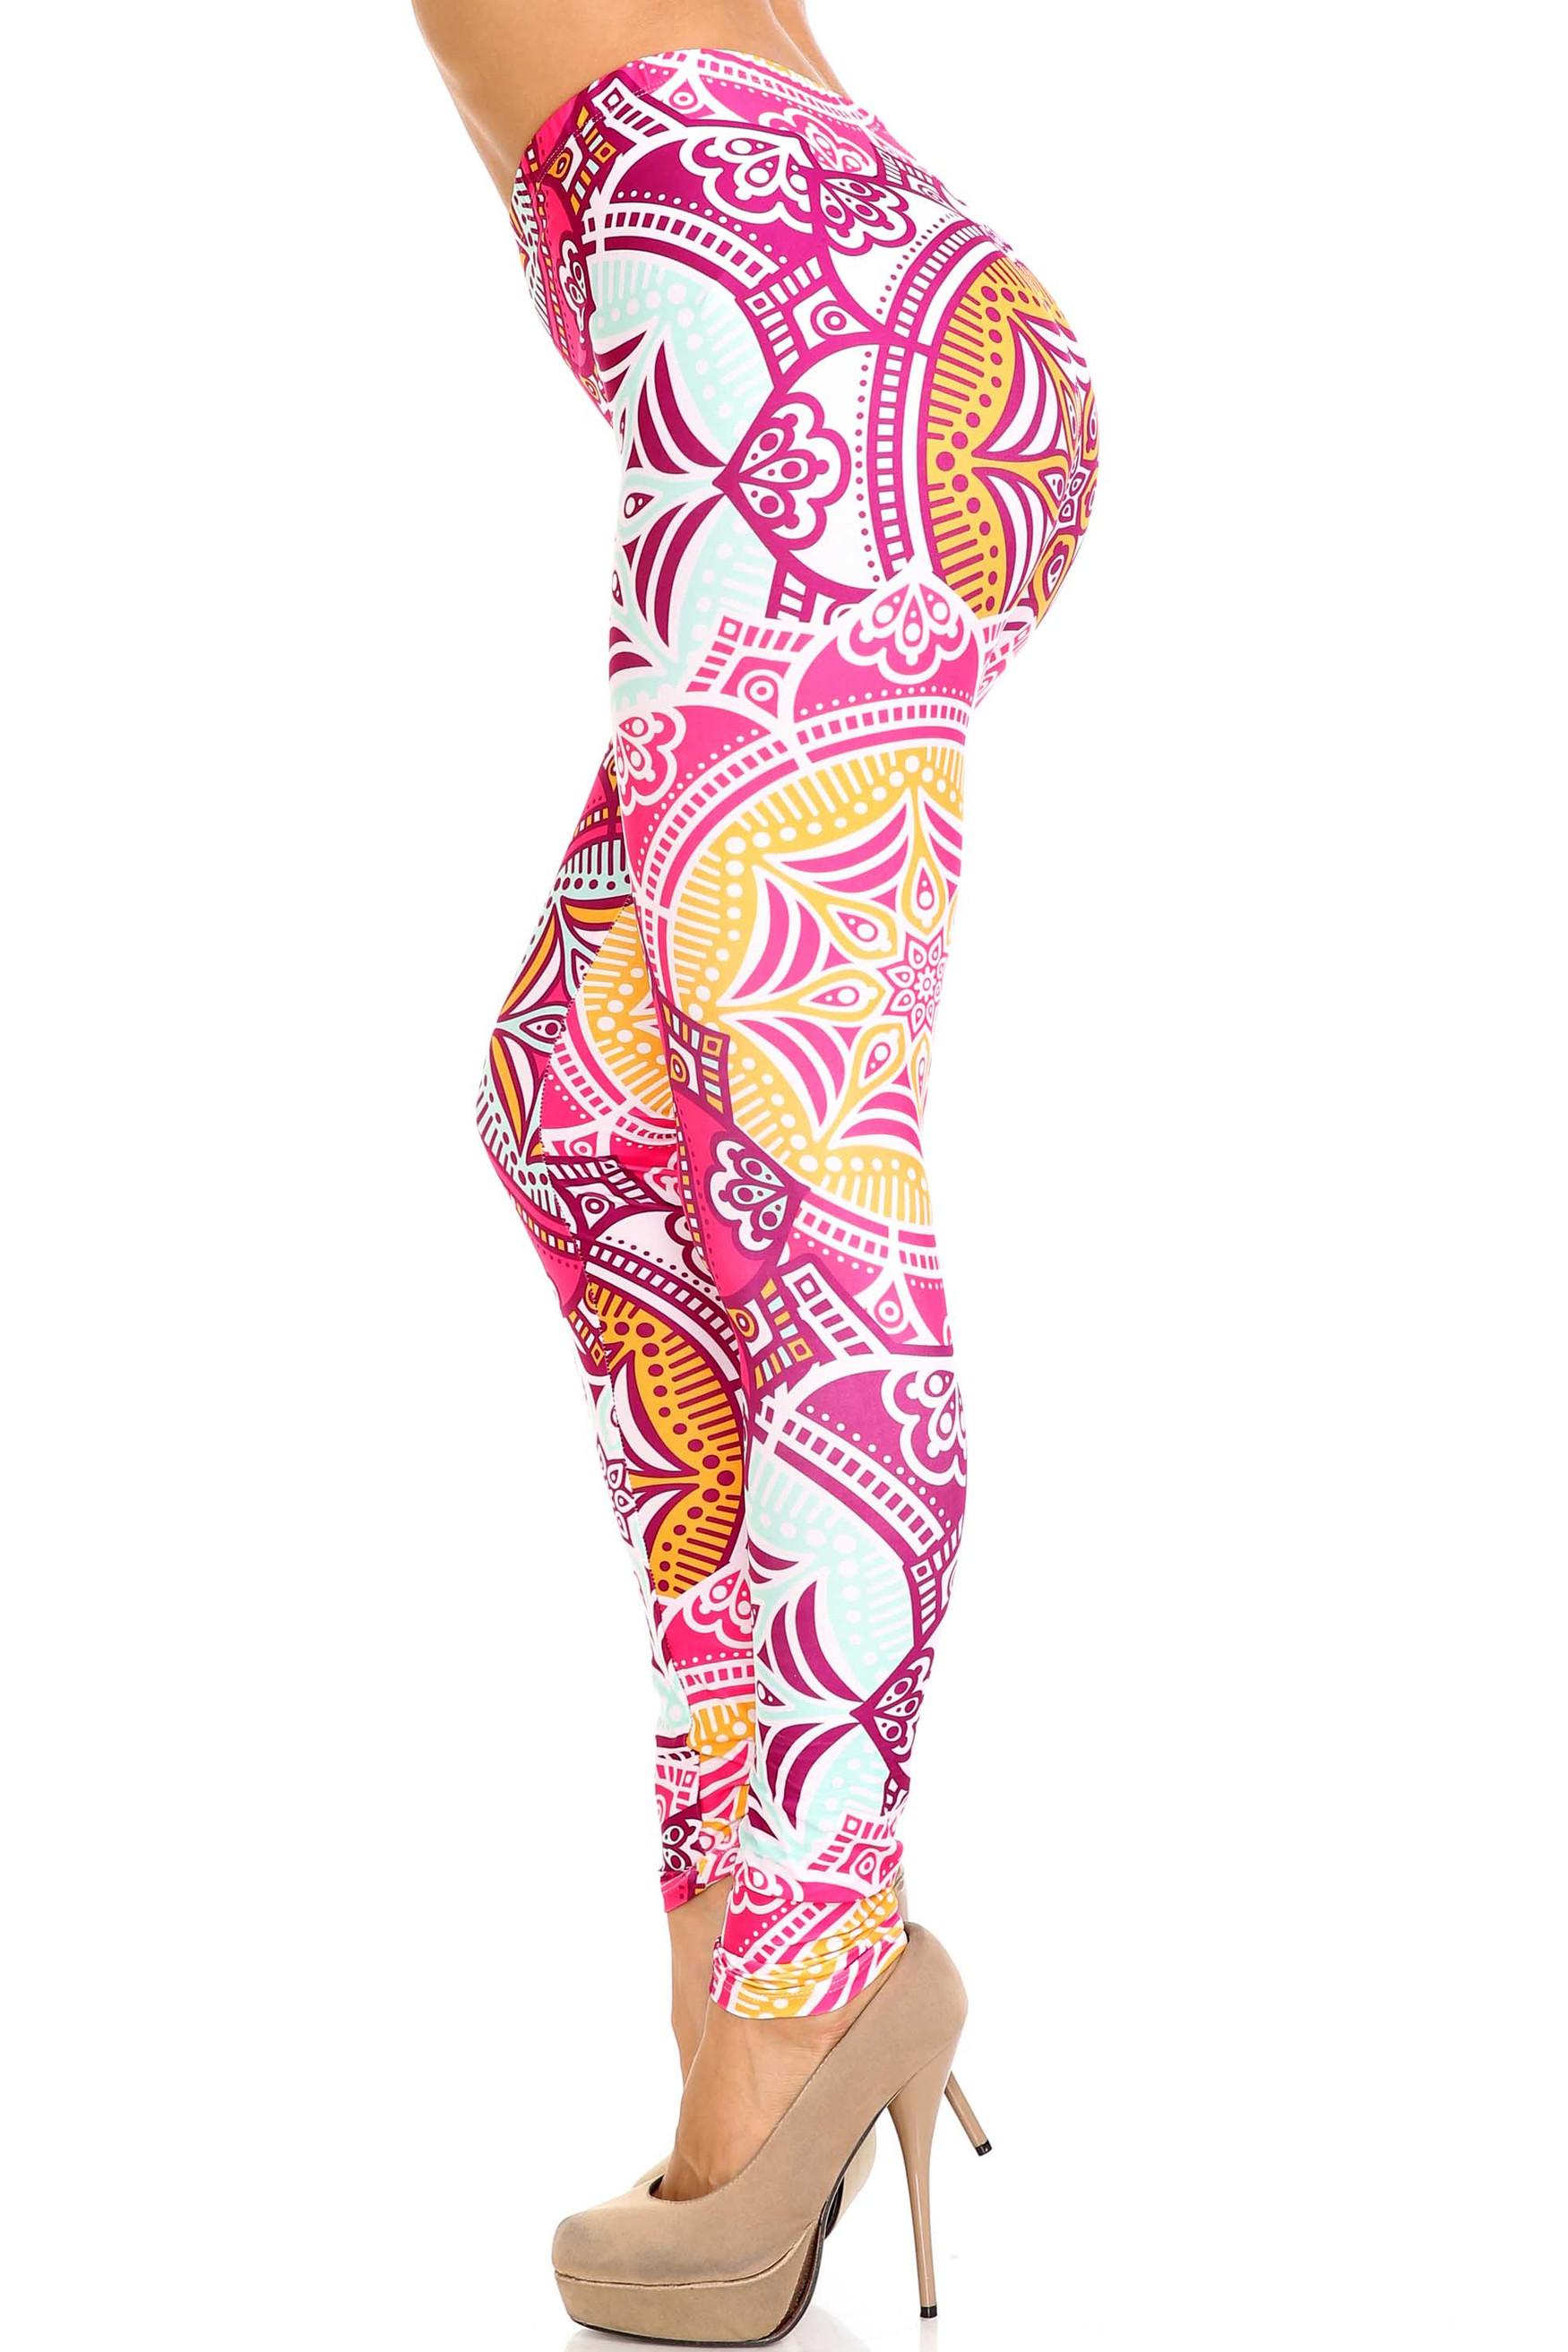 Creamy Soft Crimson Aquamarine Mandala Extra Plus Size Leggings - 3X-5X - USA Fashion™